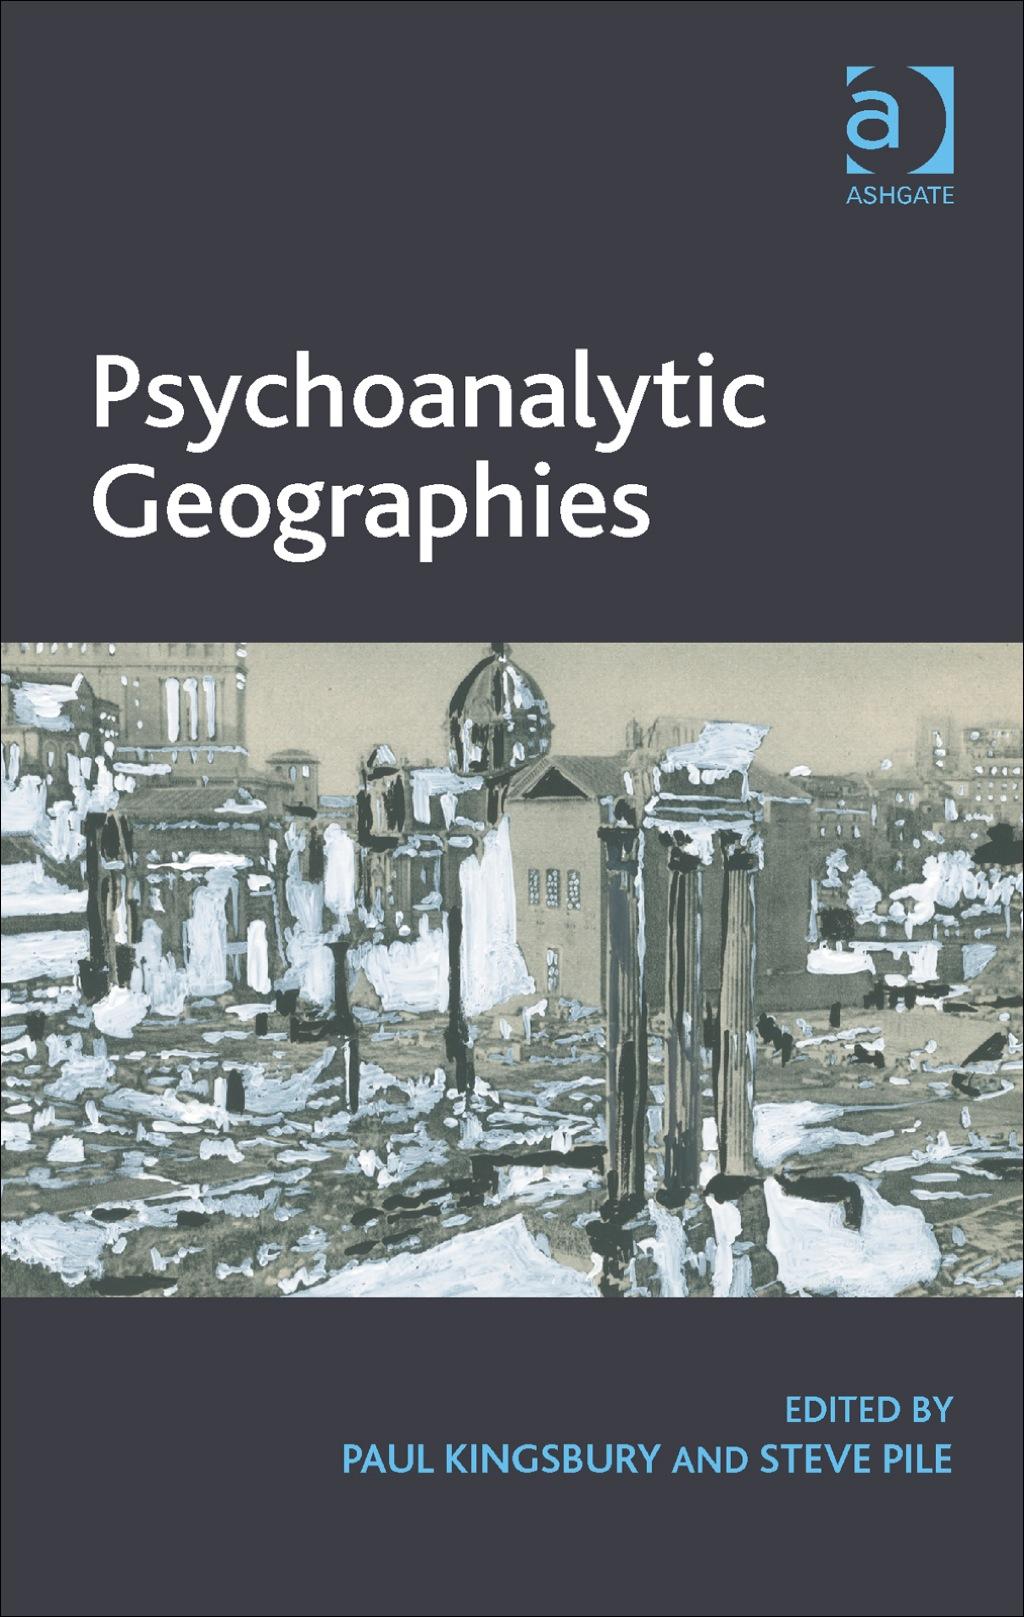 Psychoanalytic Geographies (eBook Rental)